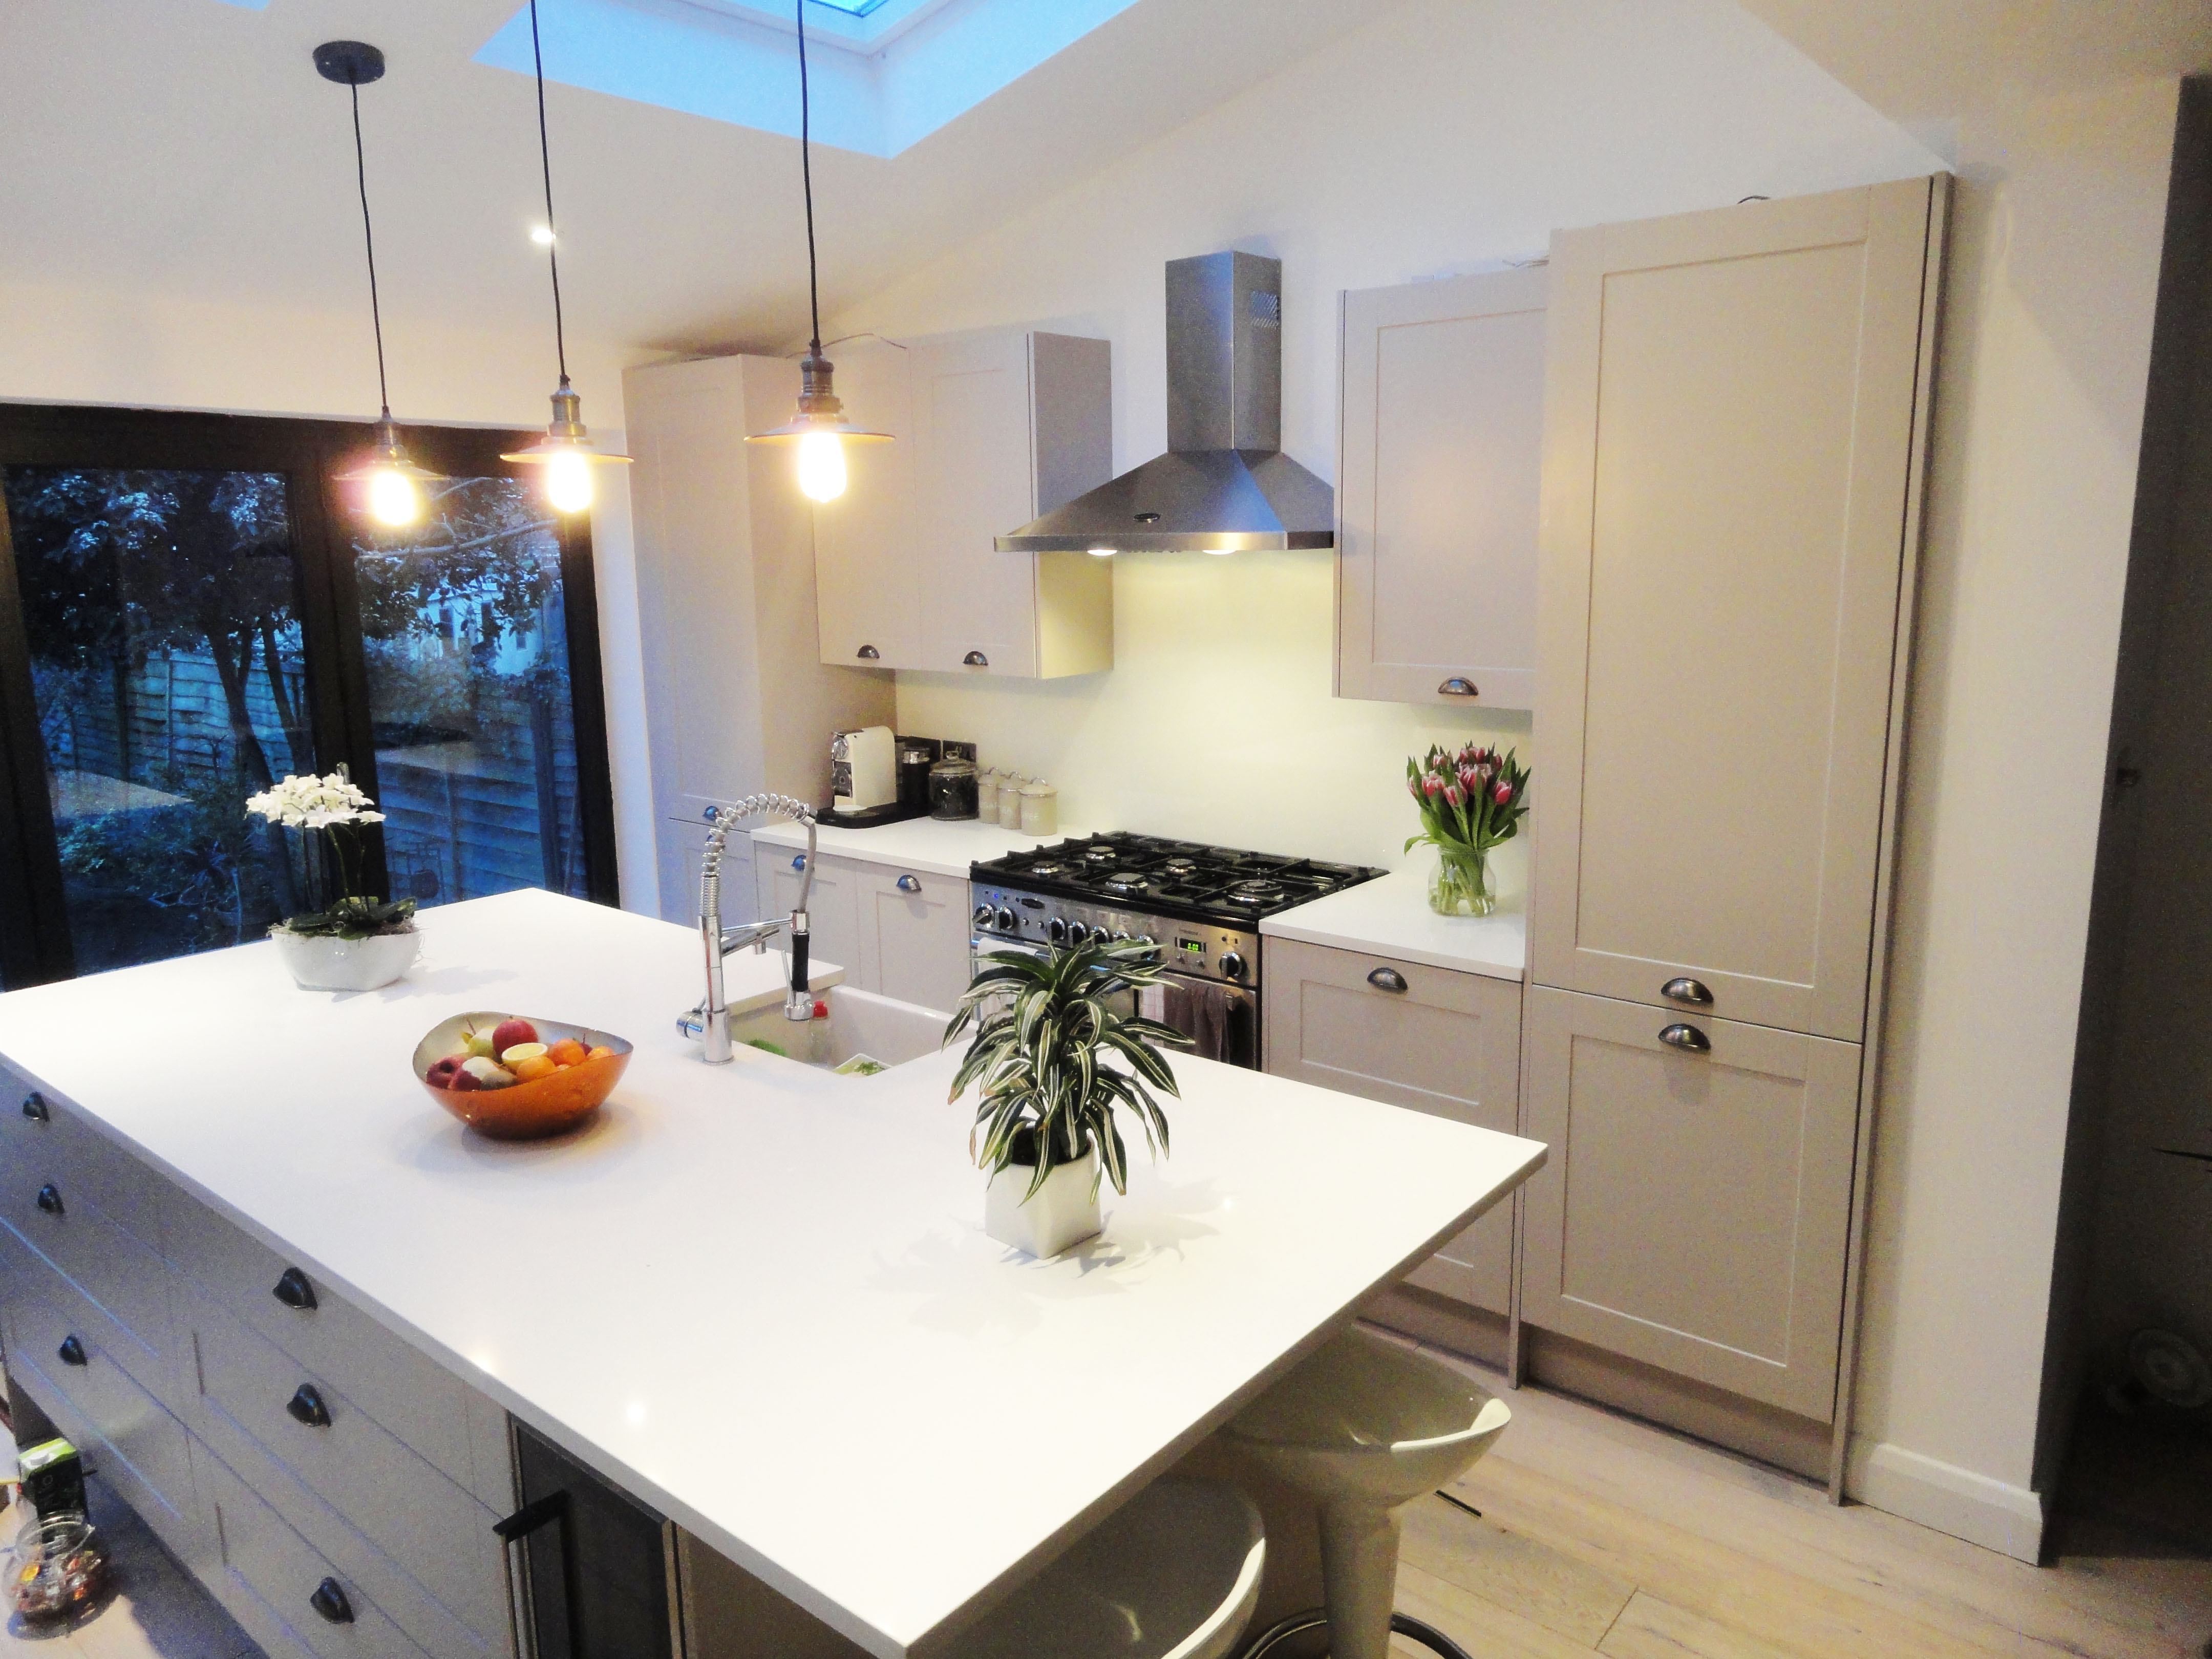 Splashback White Kitchen Finishes Glass Outlet